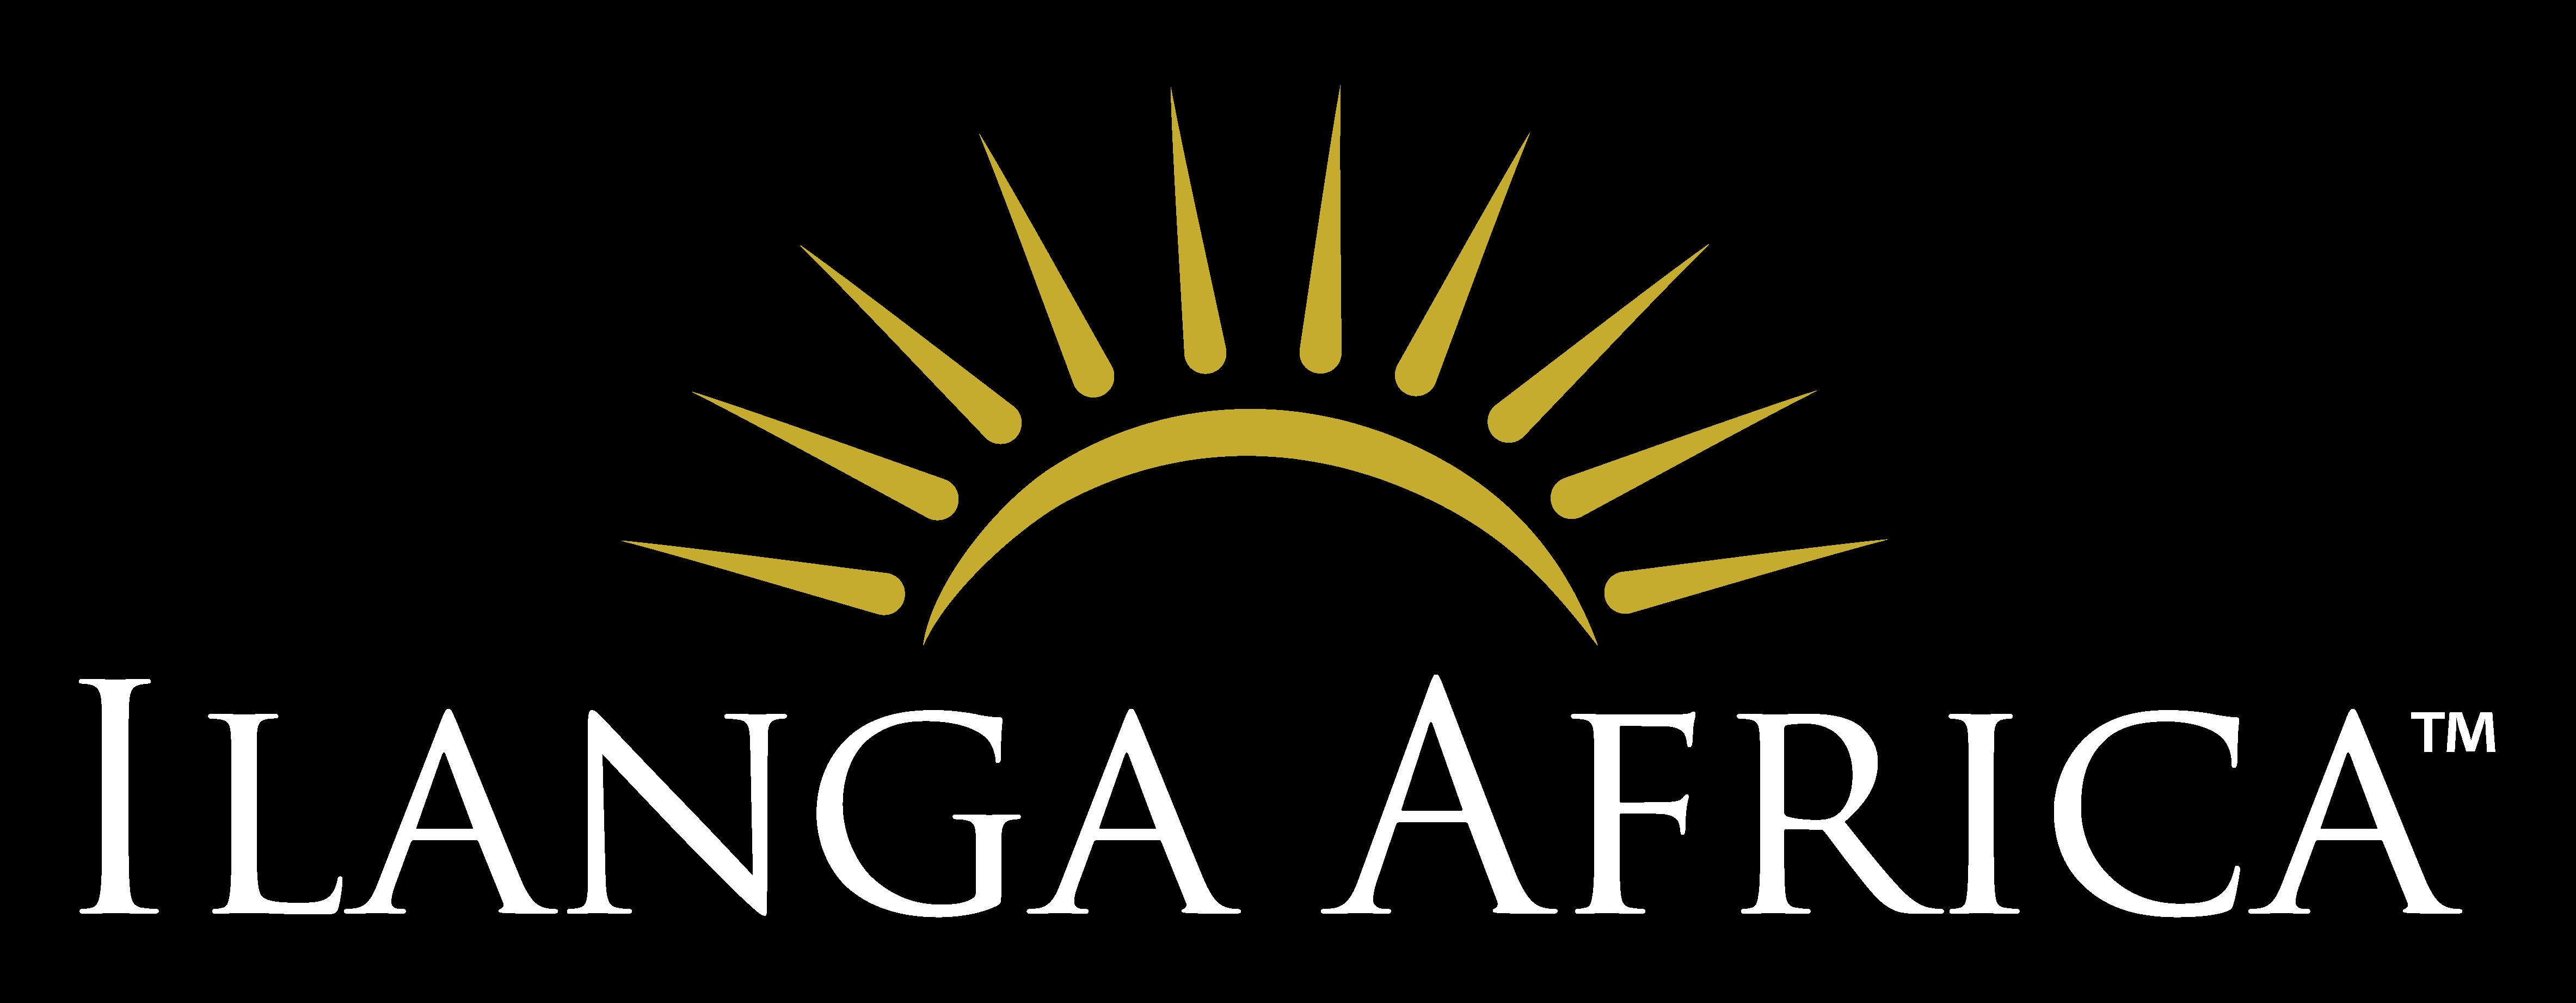 Ilanga Africa